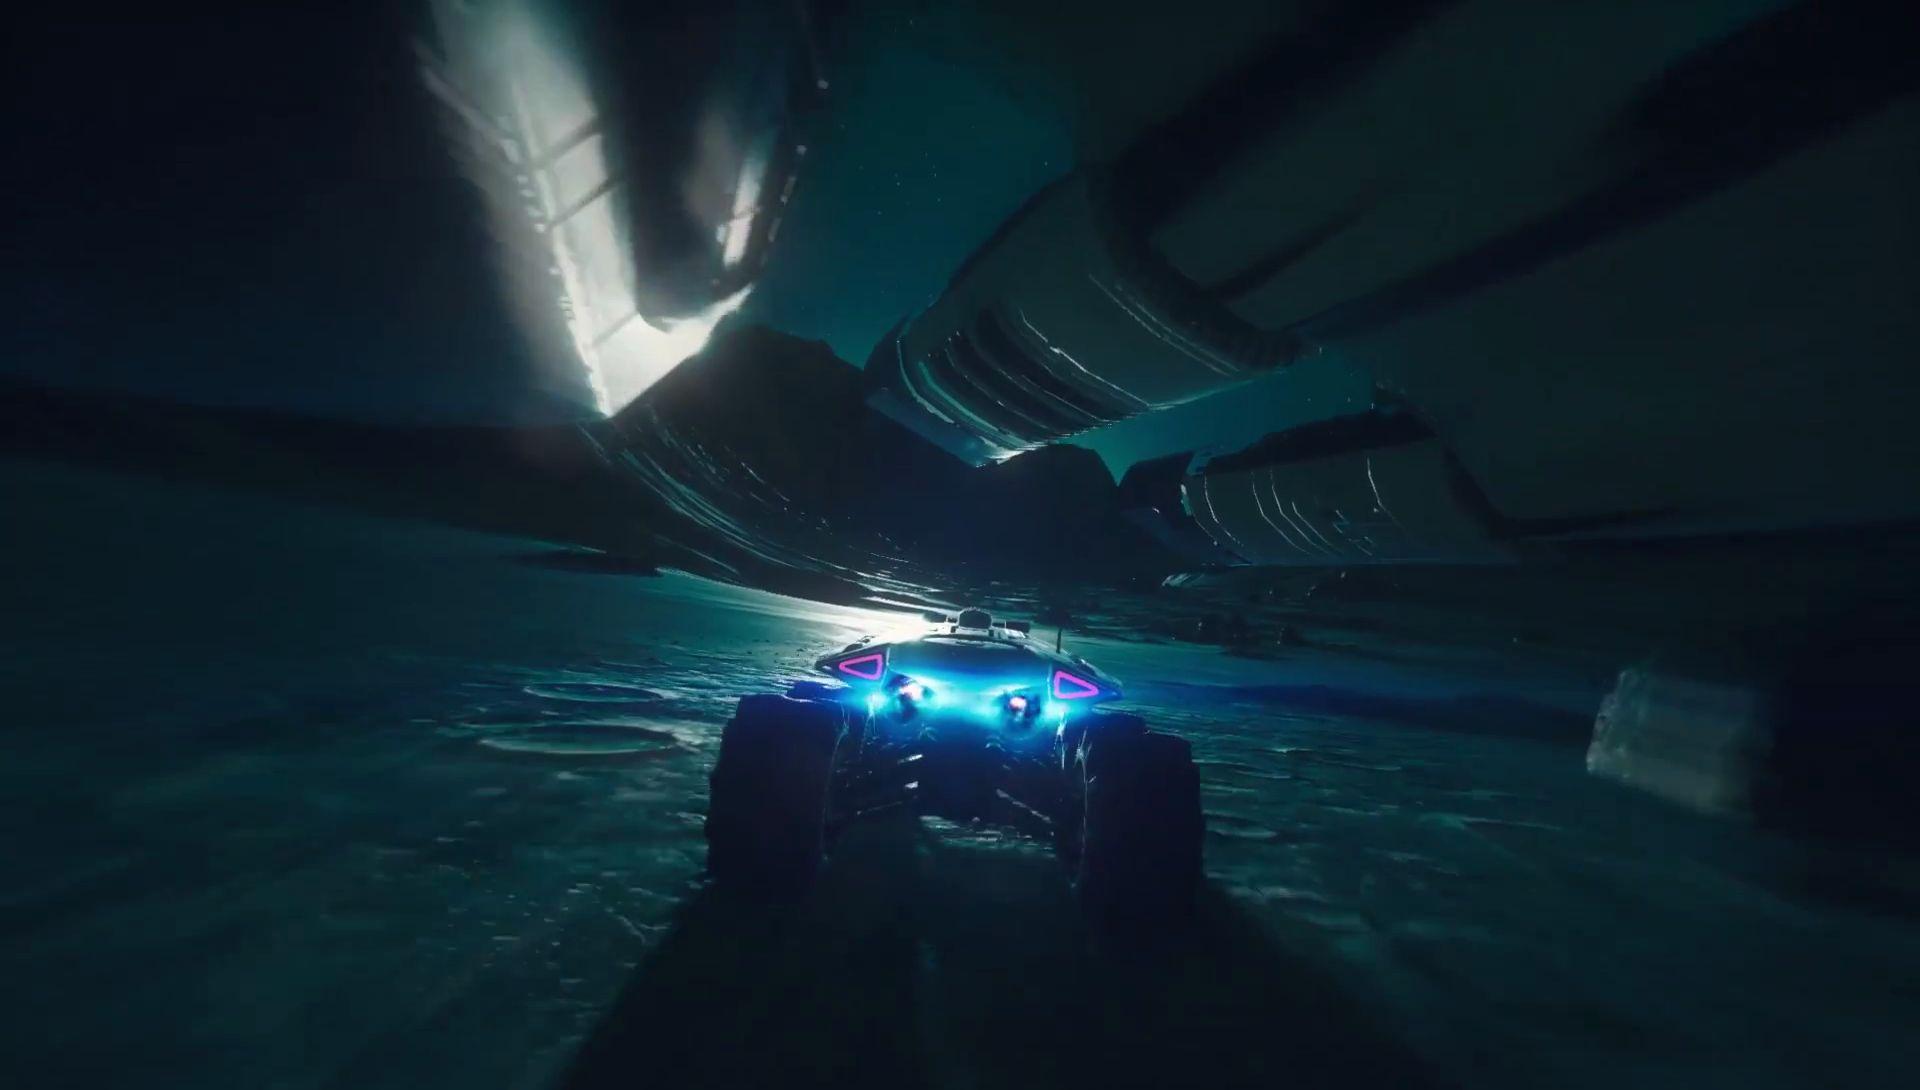 Mass effect andromeda release trailer news